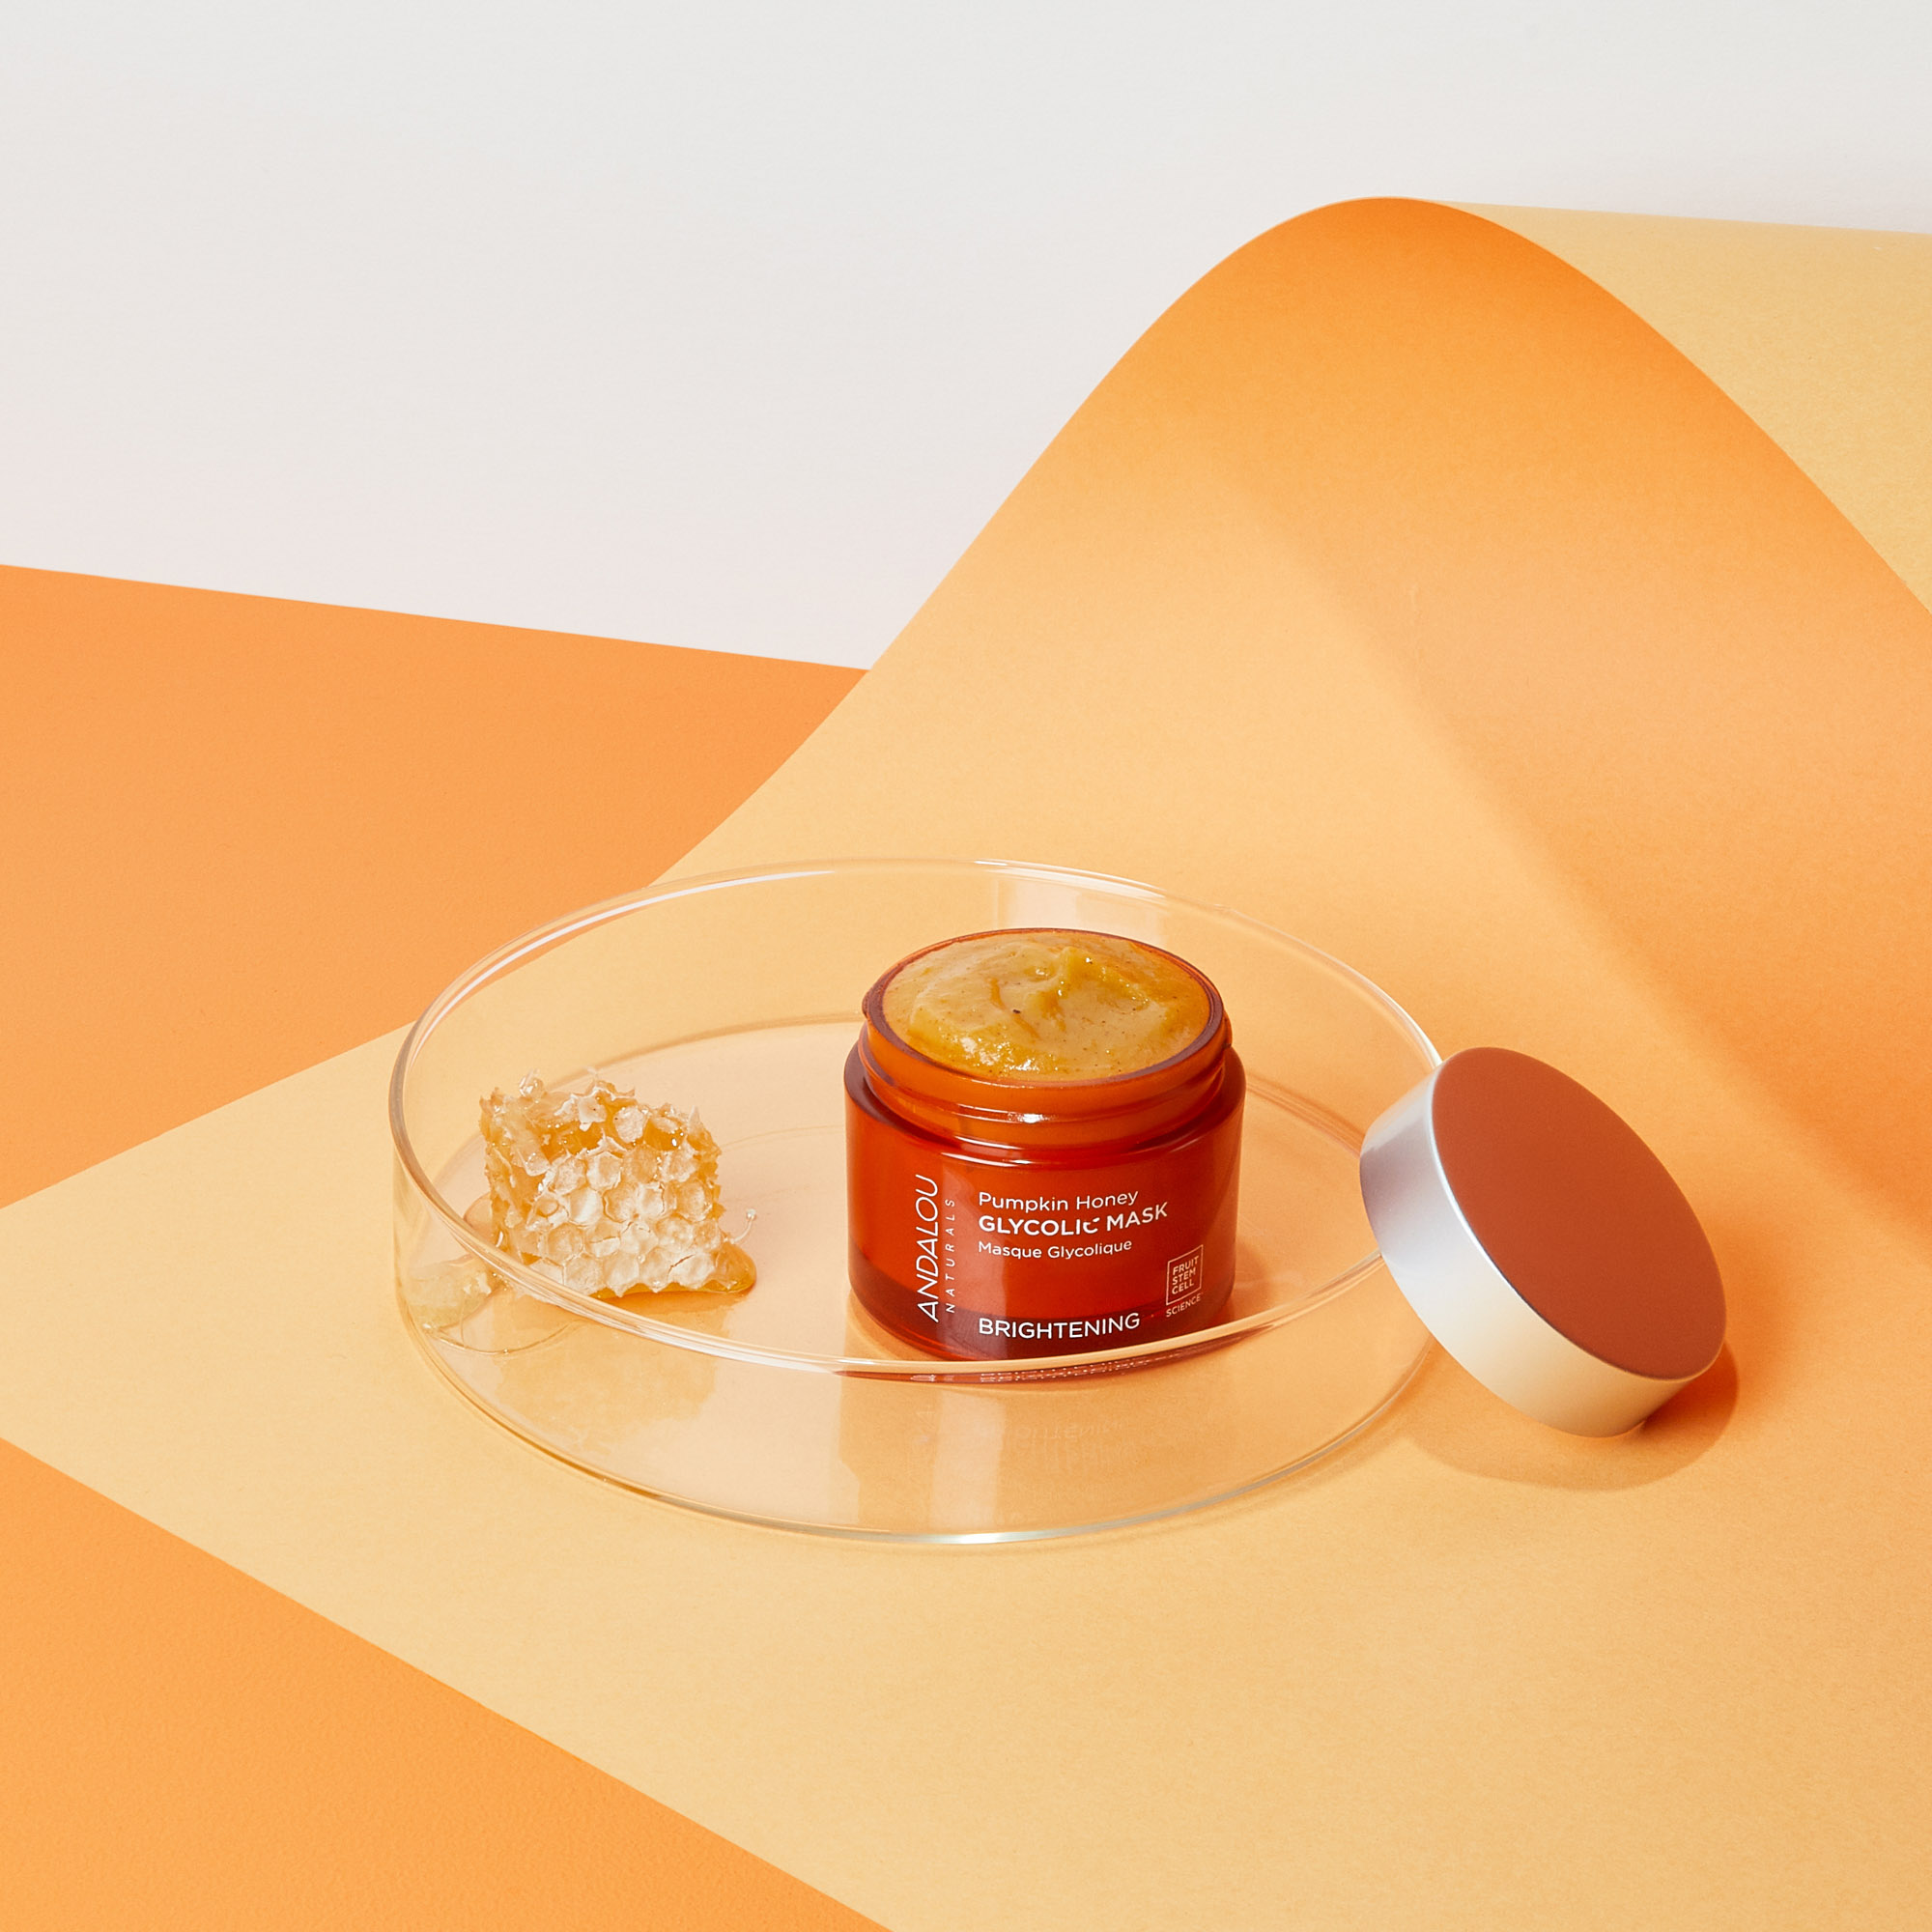 Andalou Naturals Brightening Pumpkin Honey Glycolic Mask, RRP$27.99 (2)